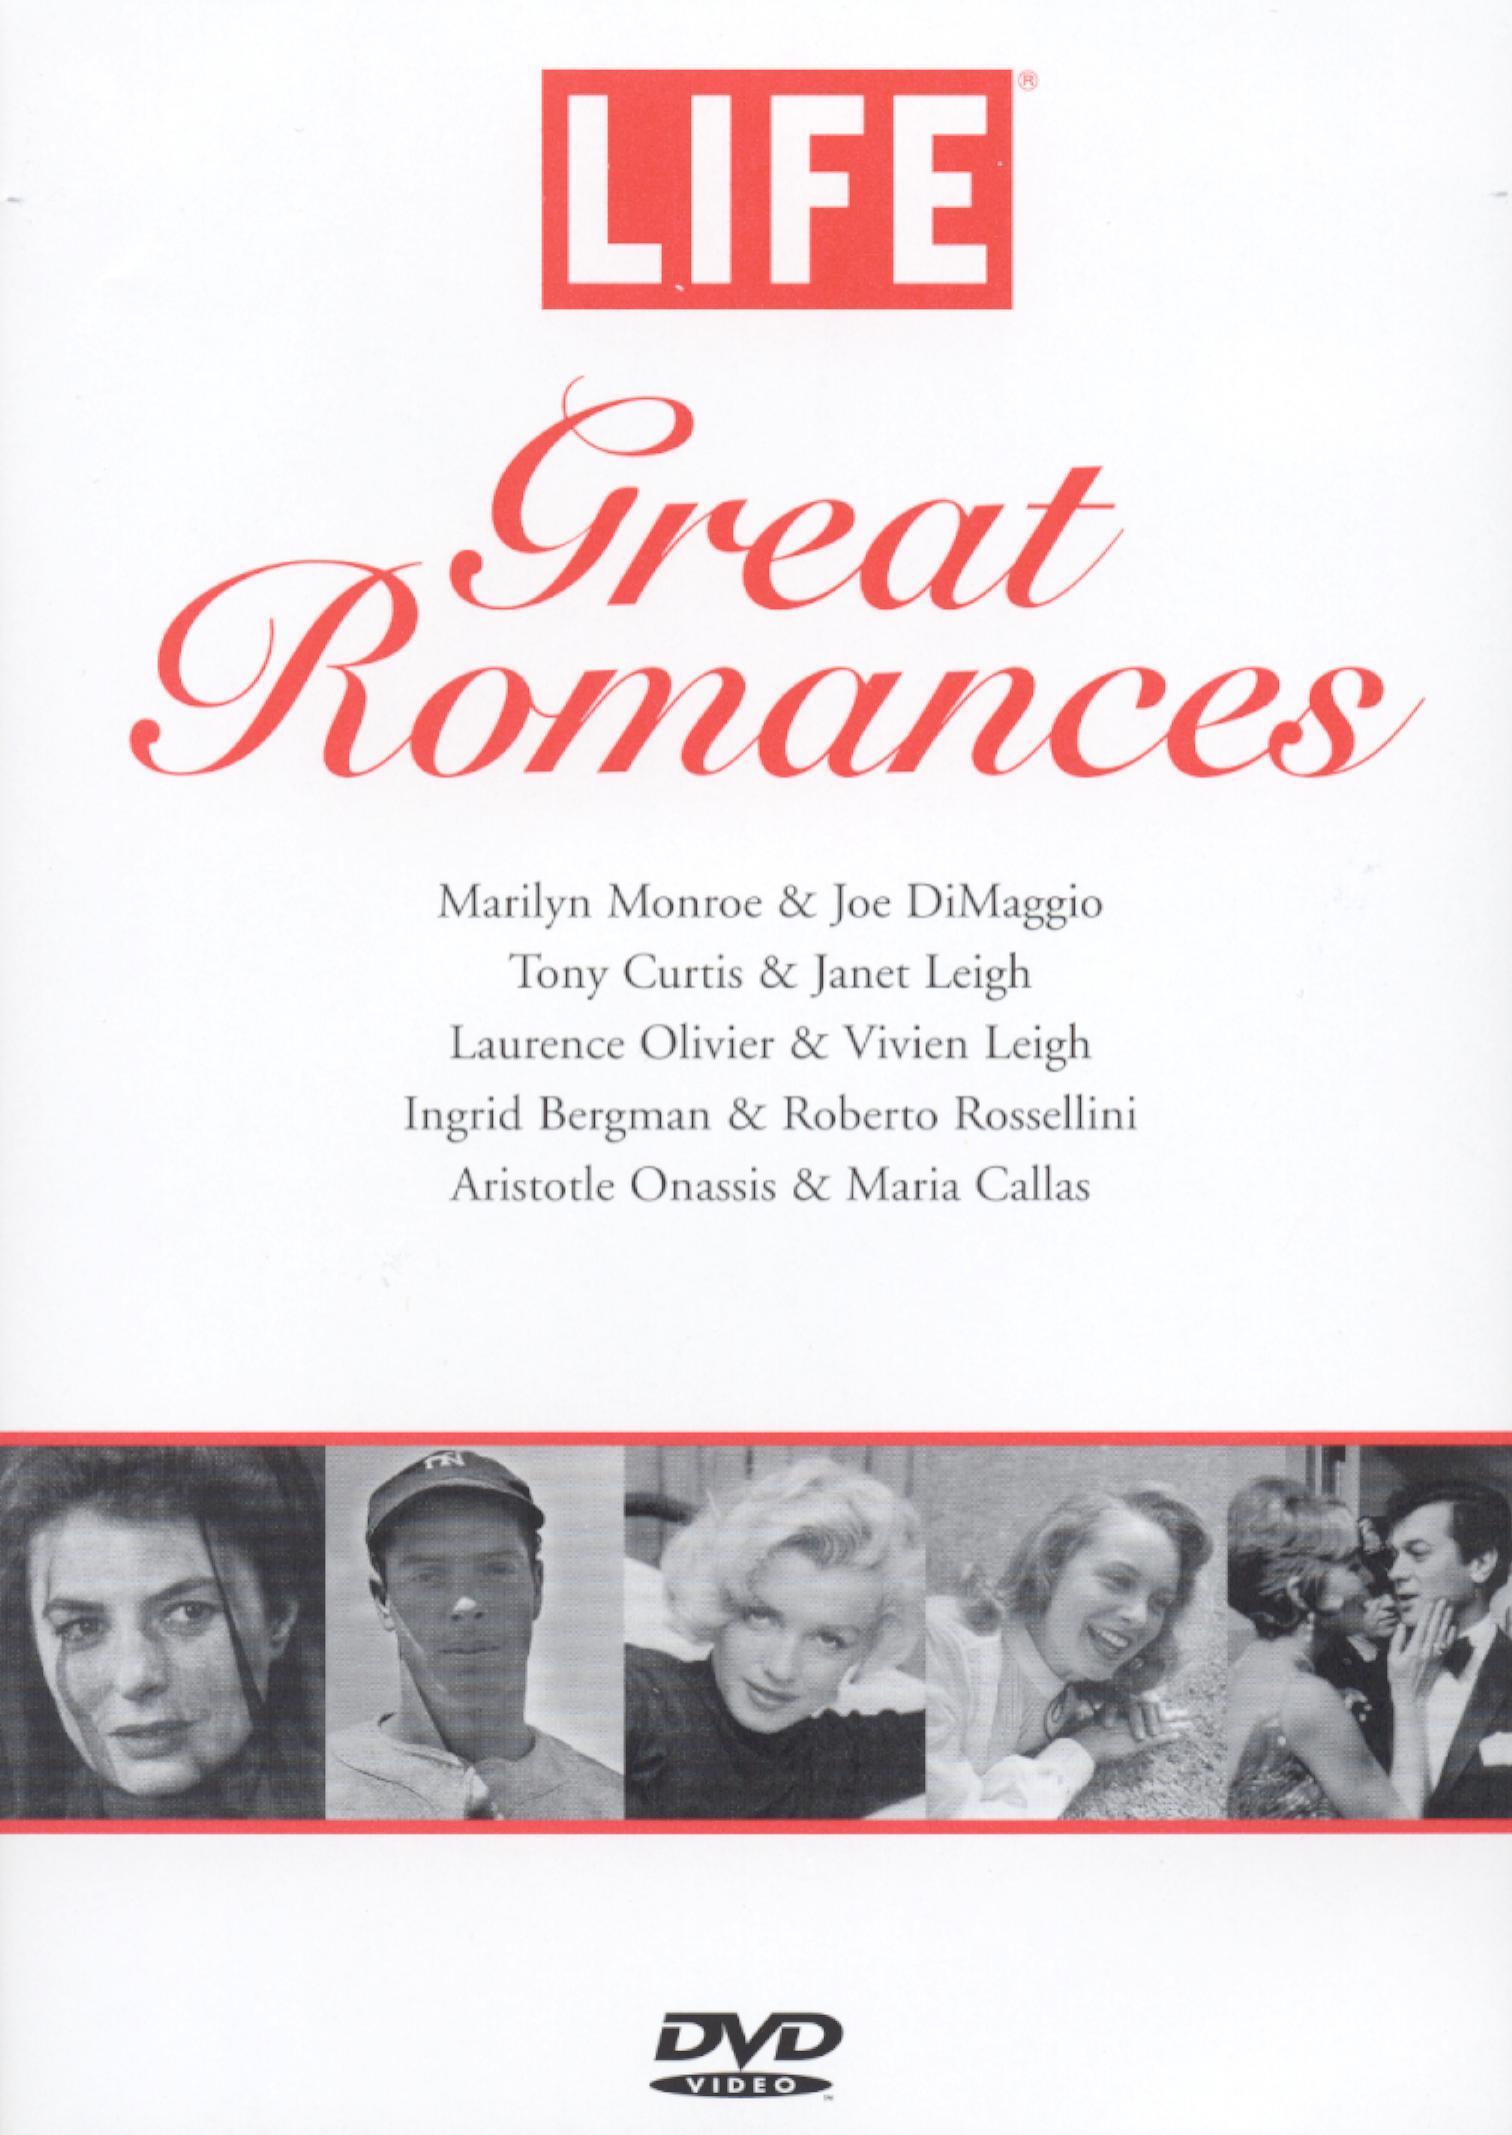 LIFE: Great Romances, Vol. 4